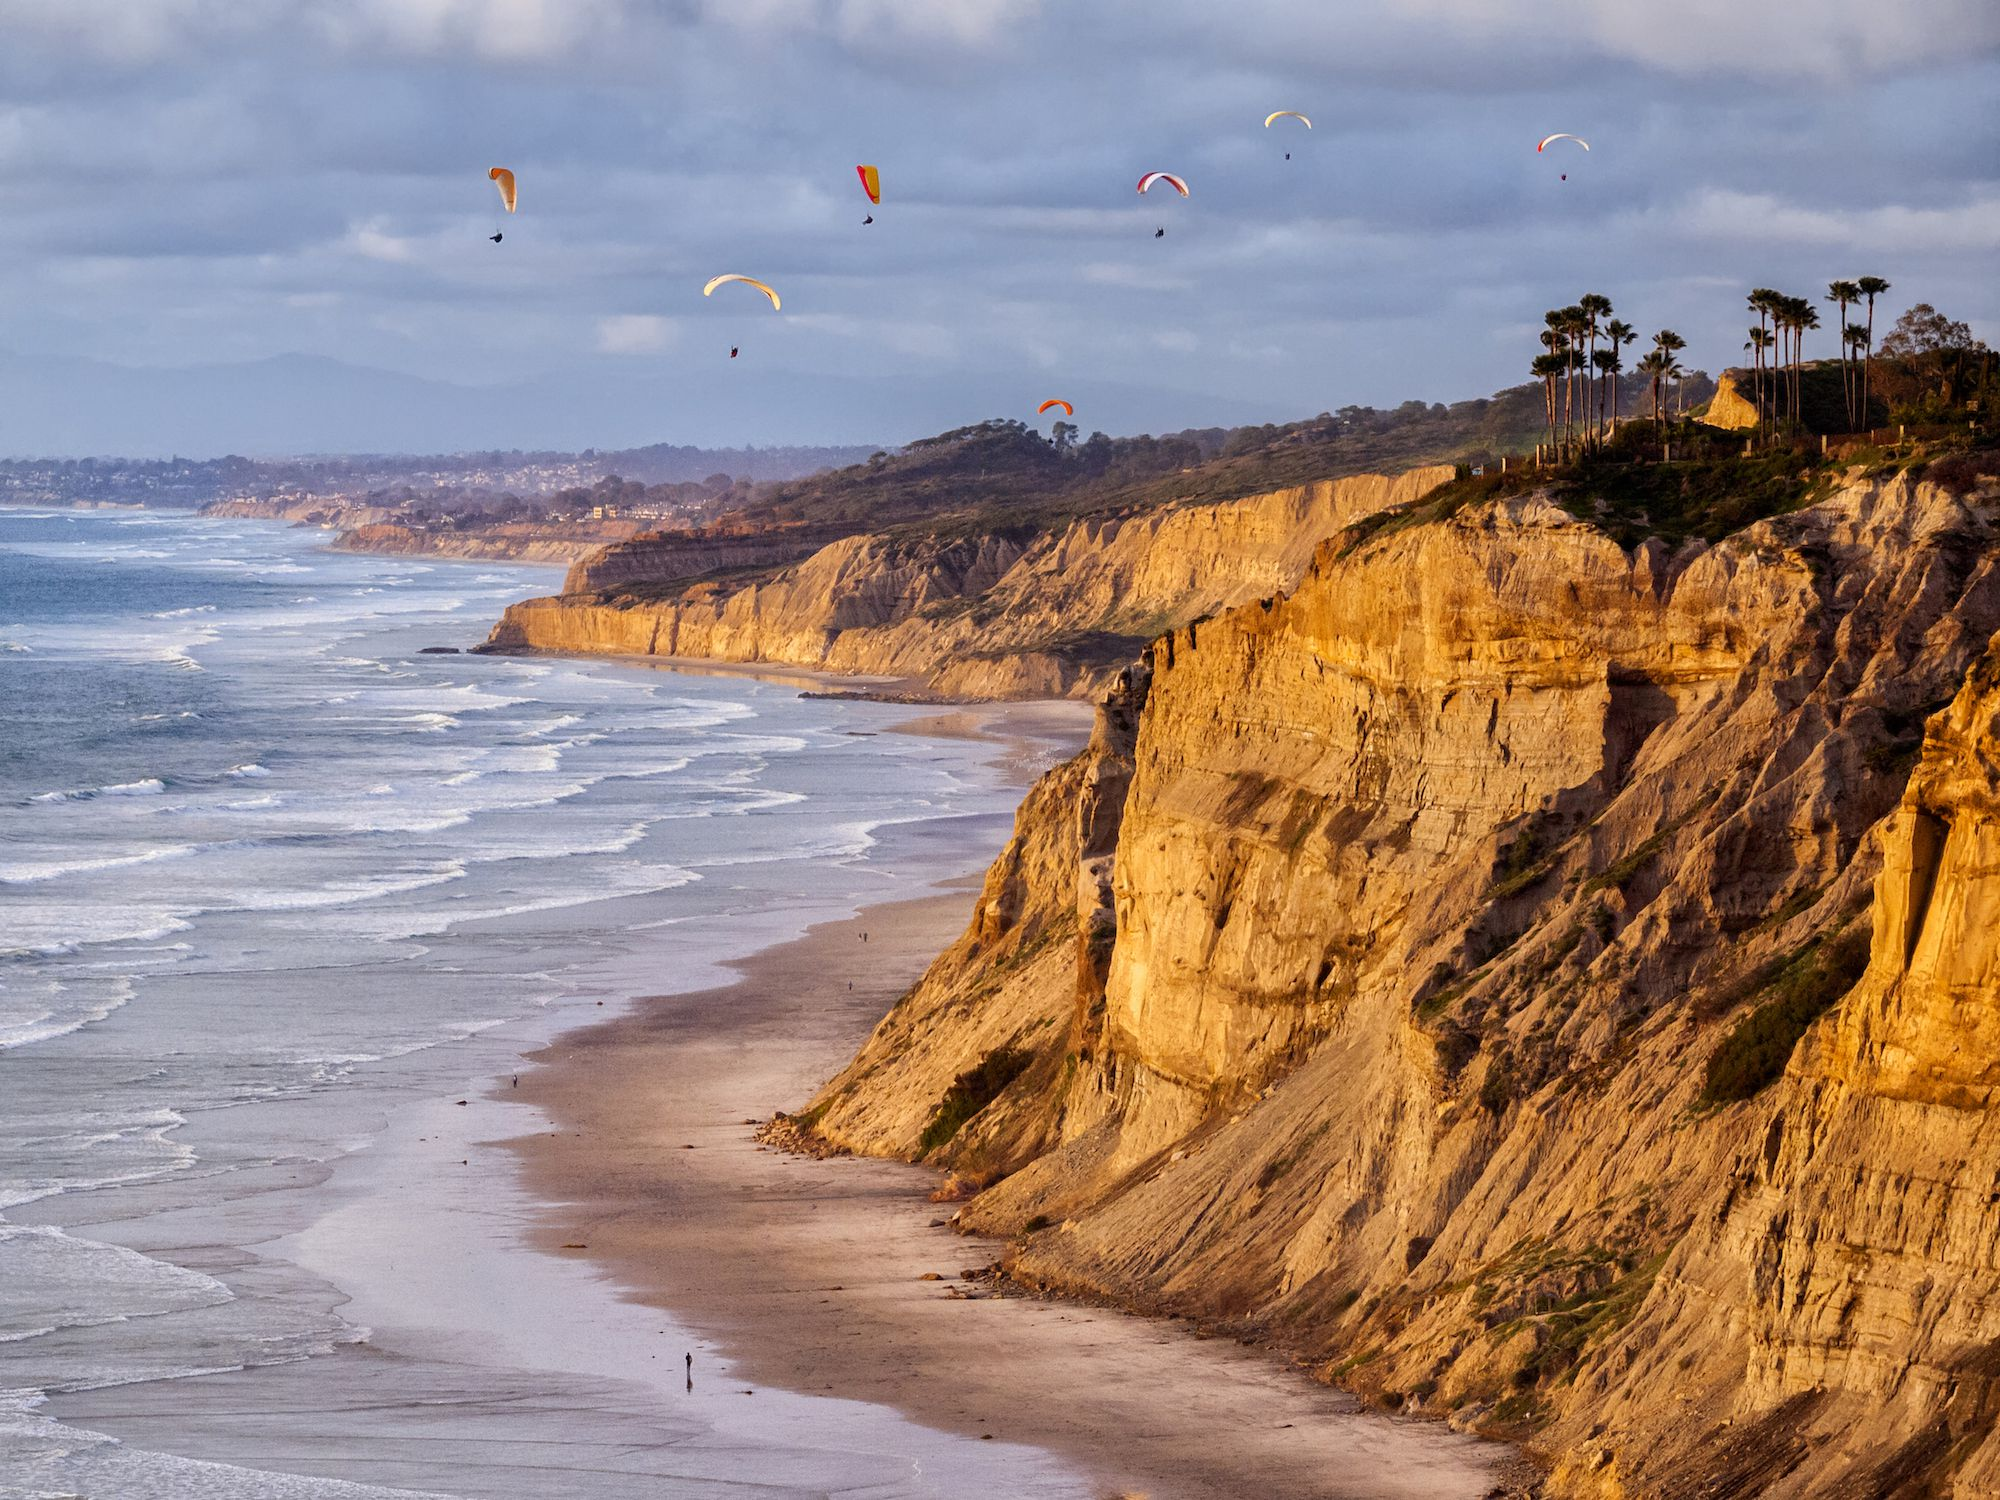 20 Best Beaches In California - Beautiful California Beaches